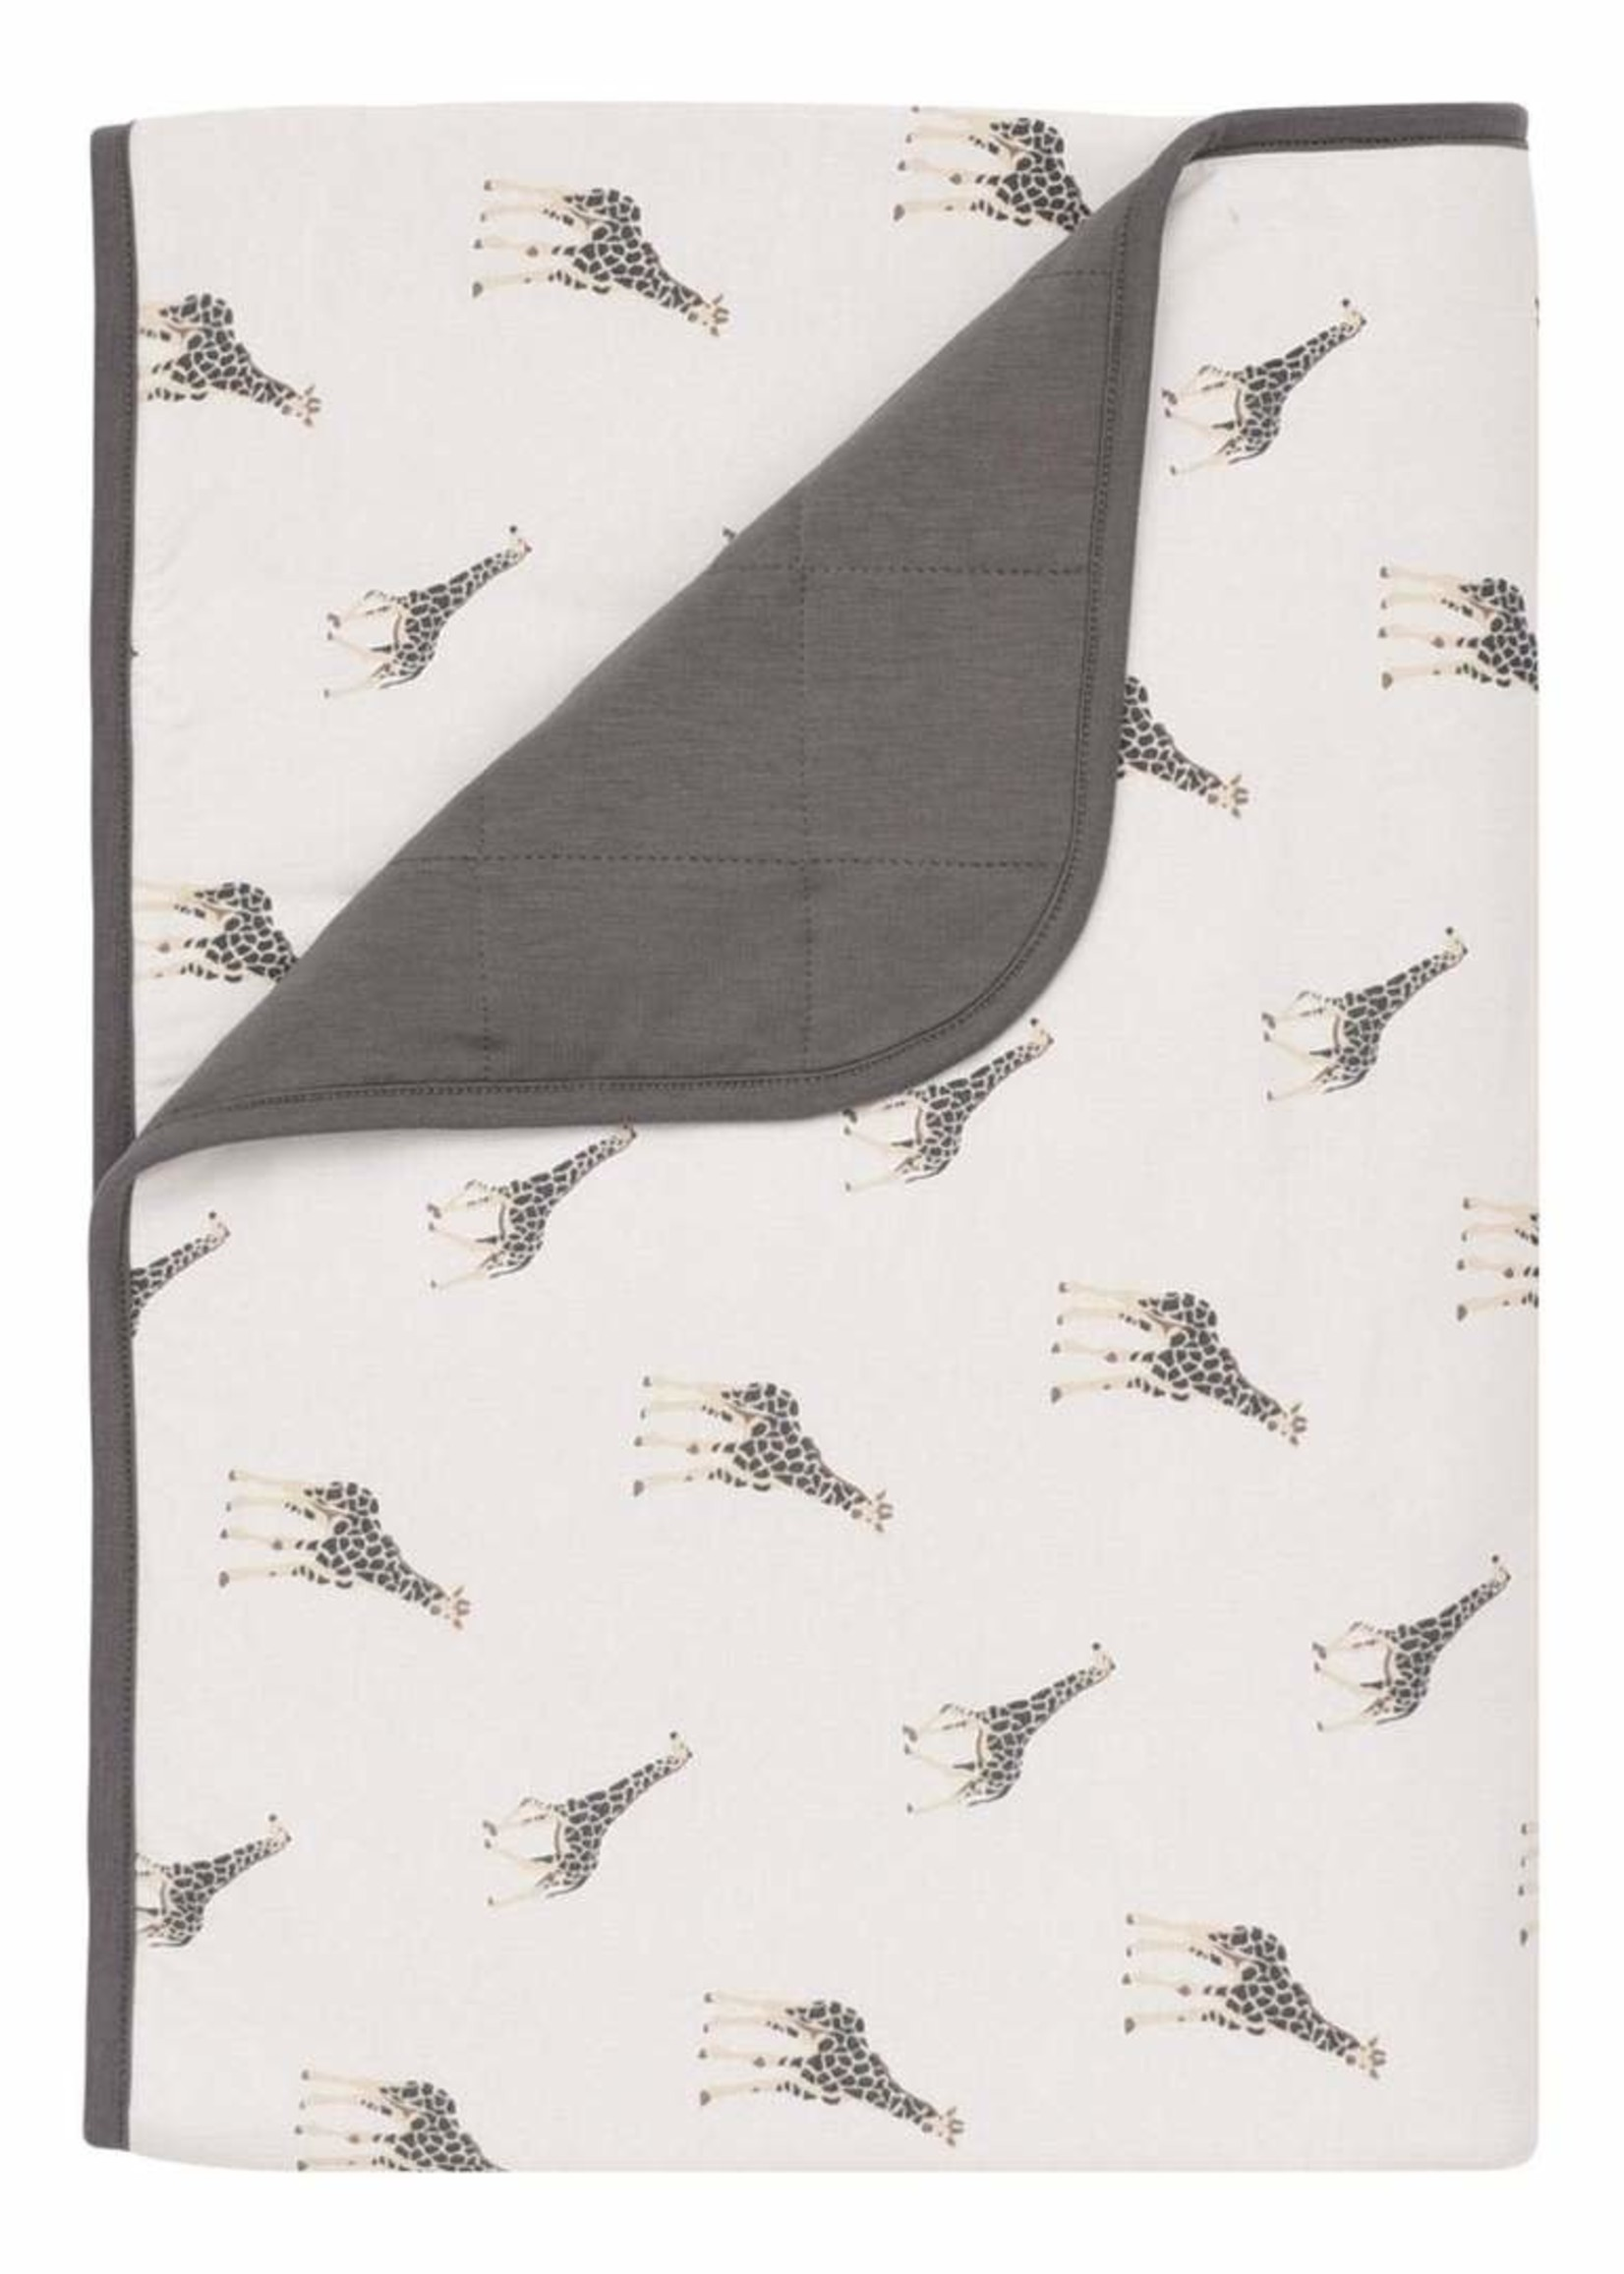 KYTE BABY Printed Toddler Blanket in Giraffe